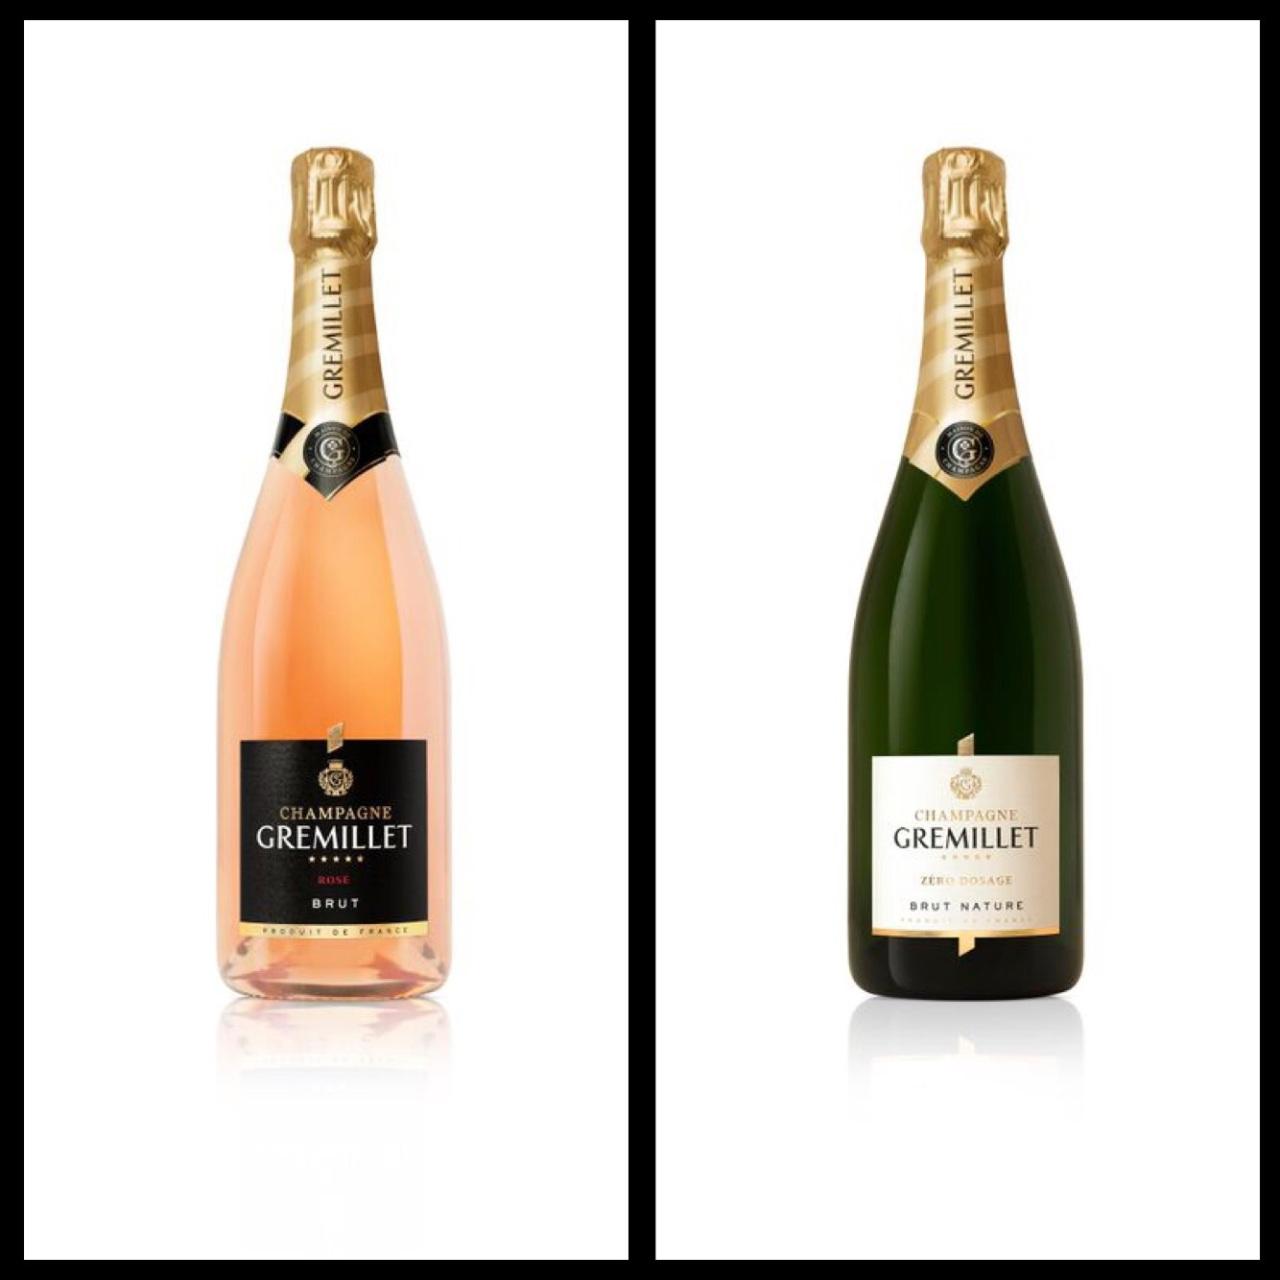 Bottle Photos Courtesy of Champagne Gremillet